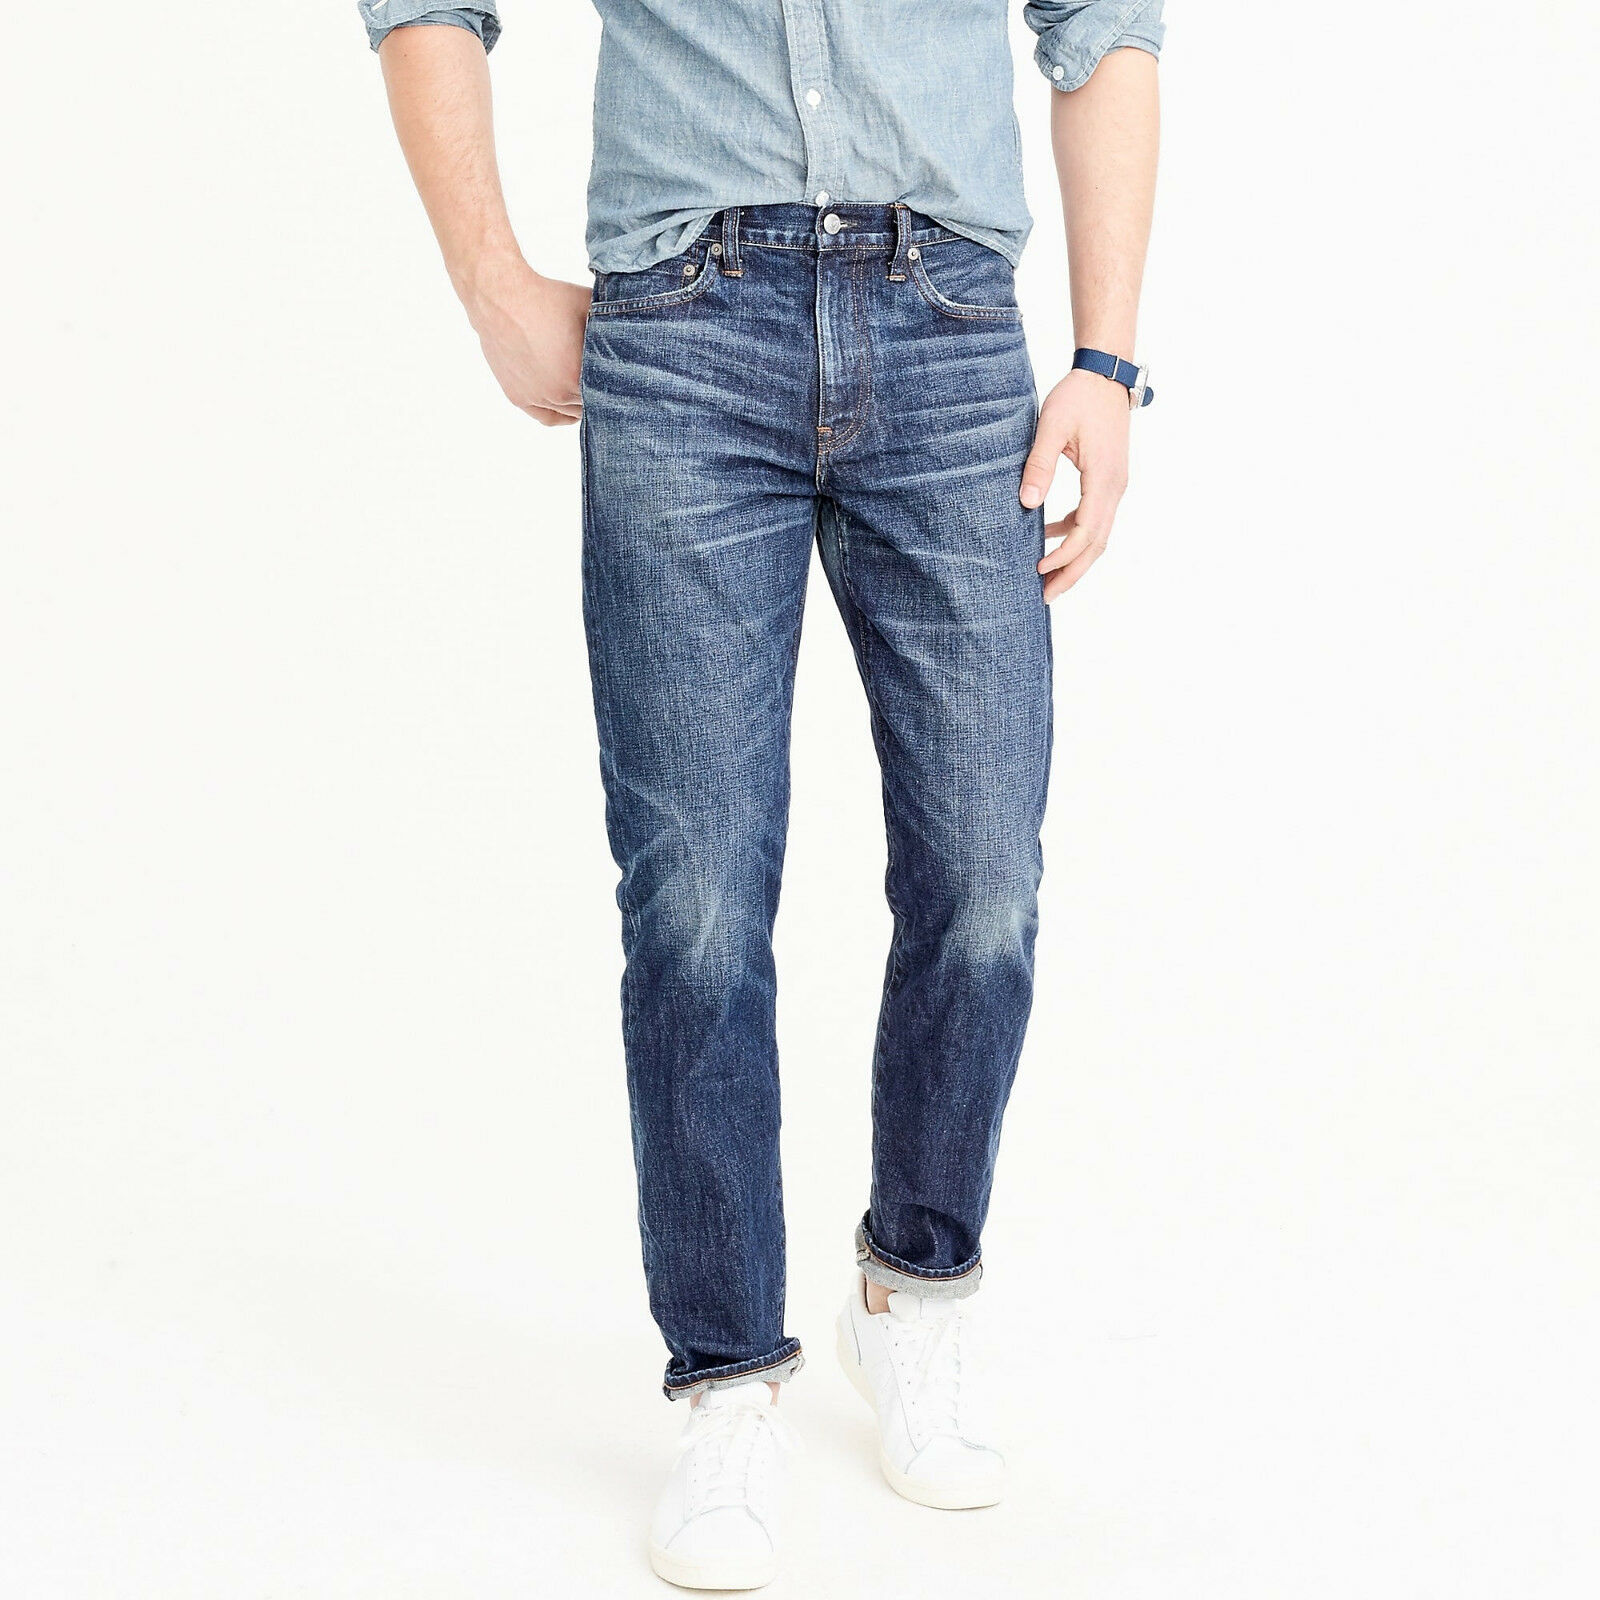 J. Crew 770 Japan Kaihara Denim Men's Slim Fit Jeans Collins Wash  NEW 34x30